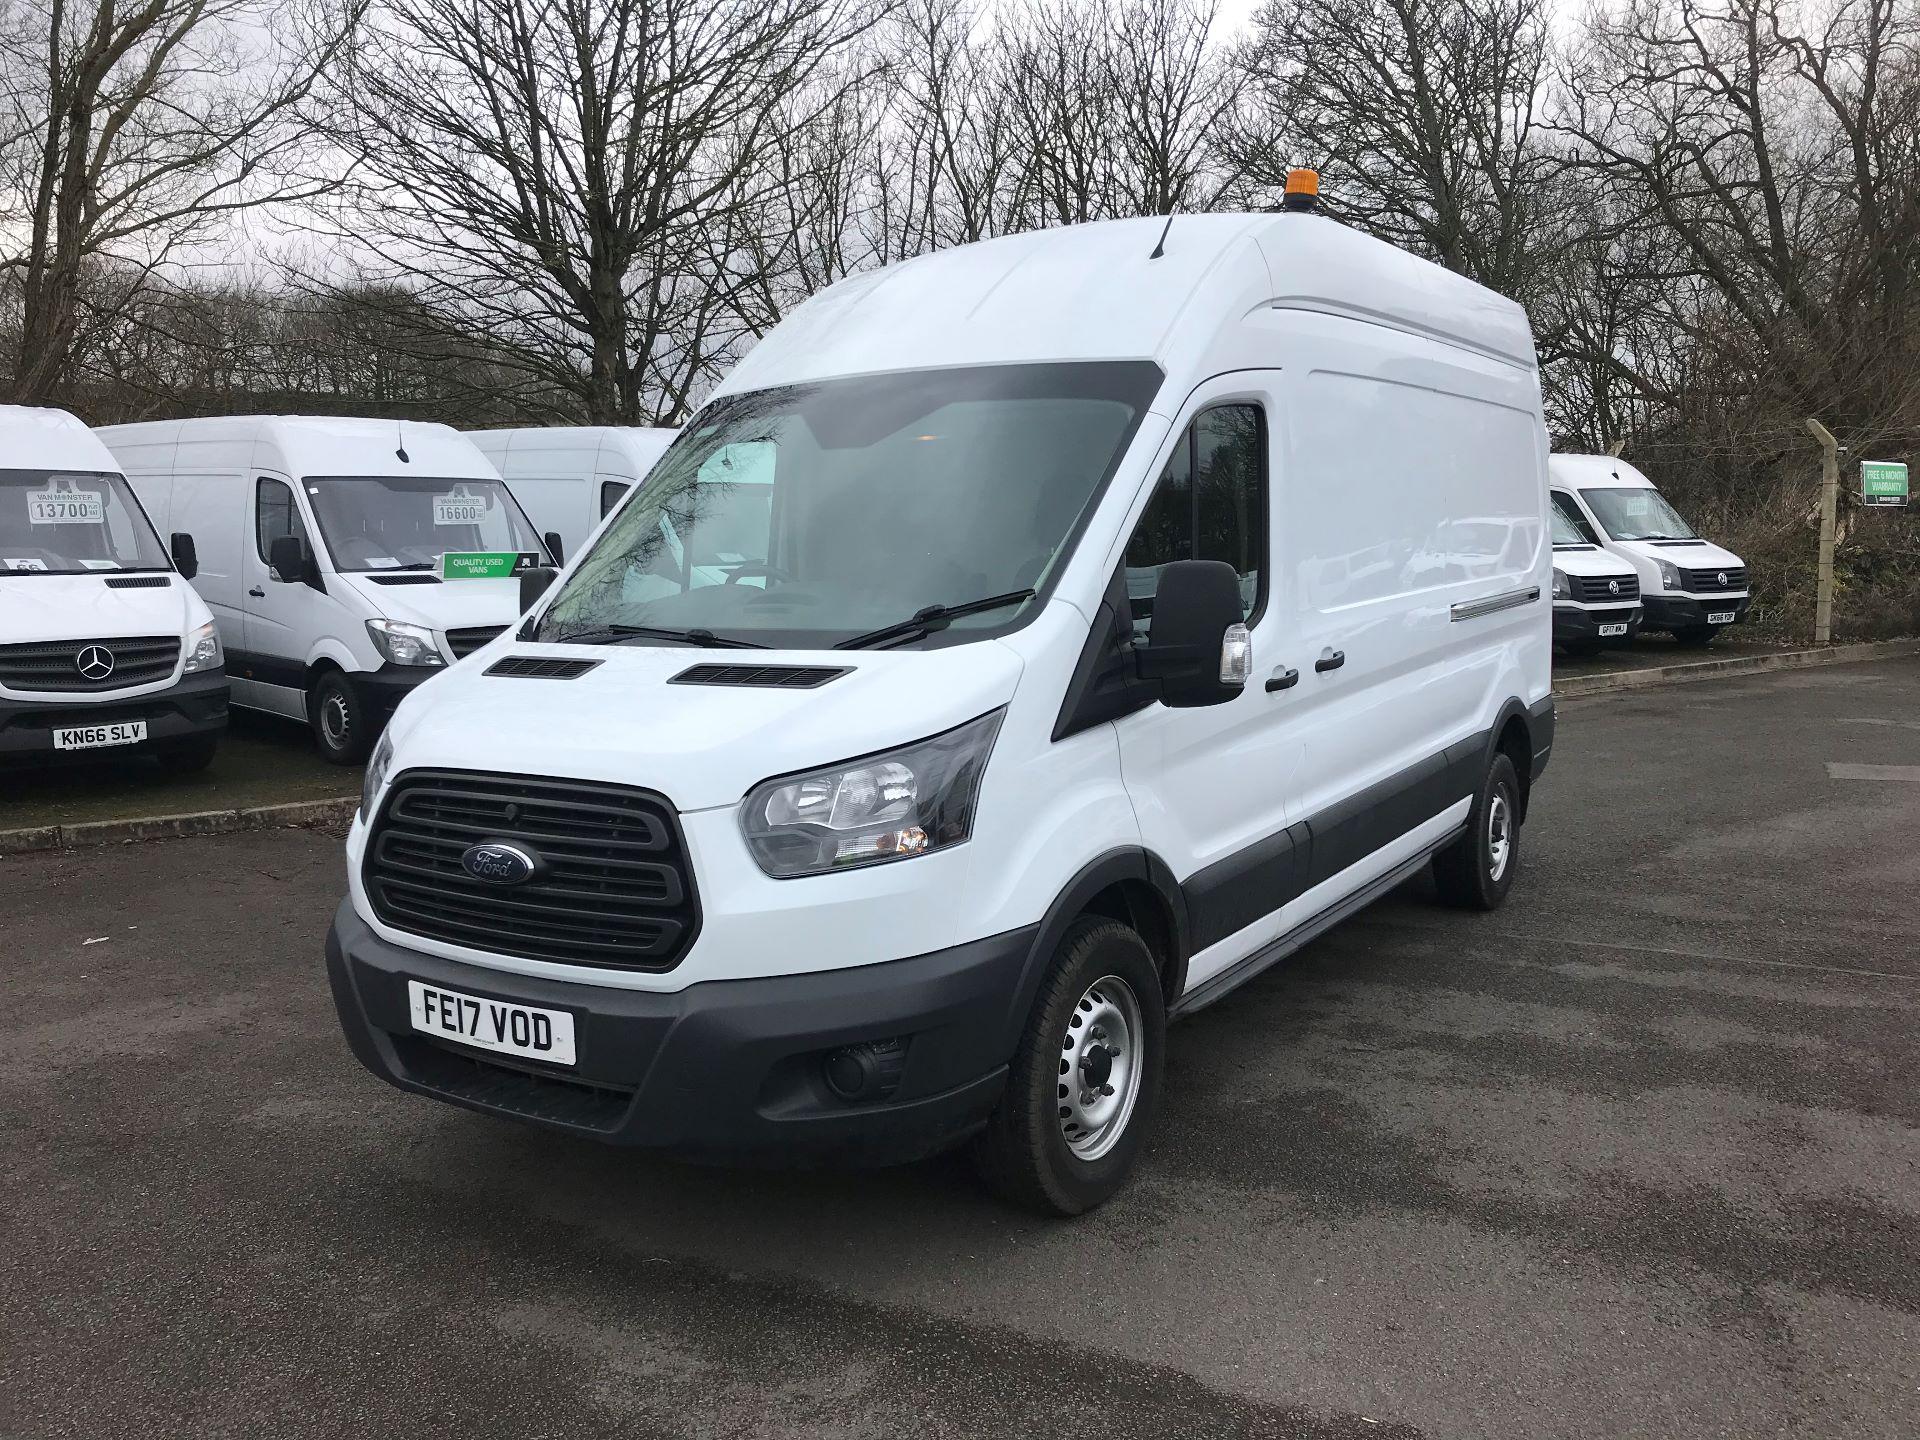 2017 Ford Transit L3 H3 VAN 130PS EURO 6 (FE17VOD) Image 3